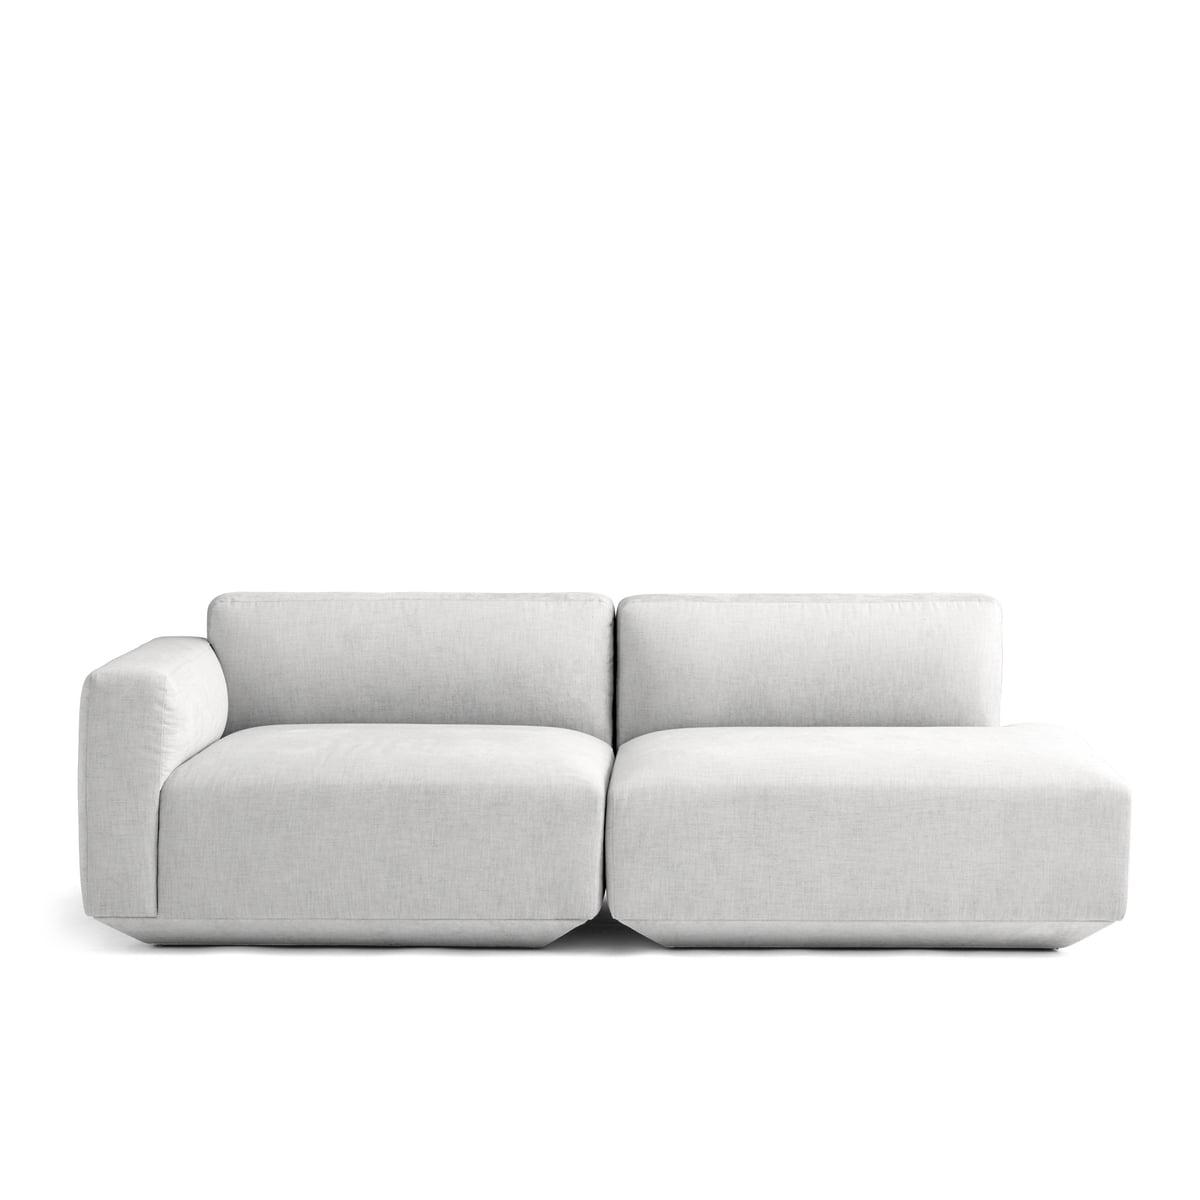 Andtradition develius 2 sitzer sofa konfiguration g kvadrat maple 112